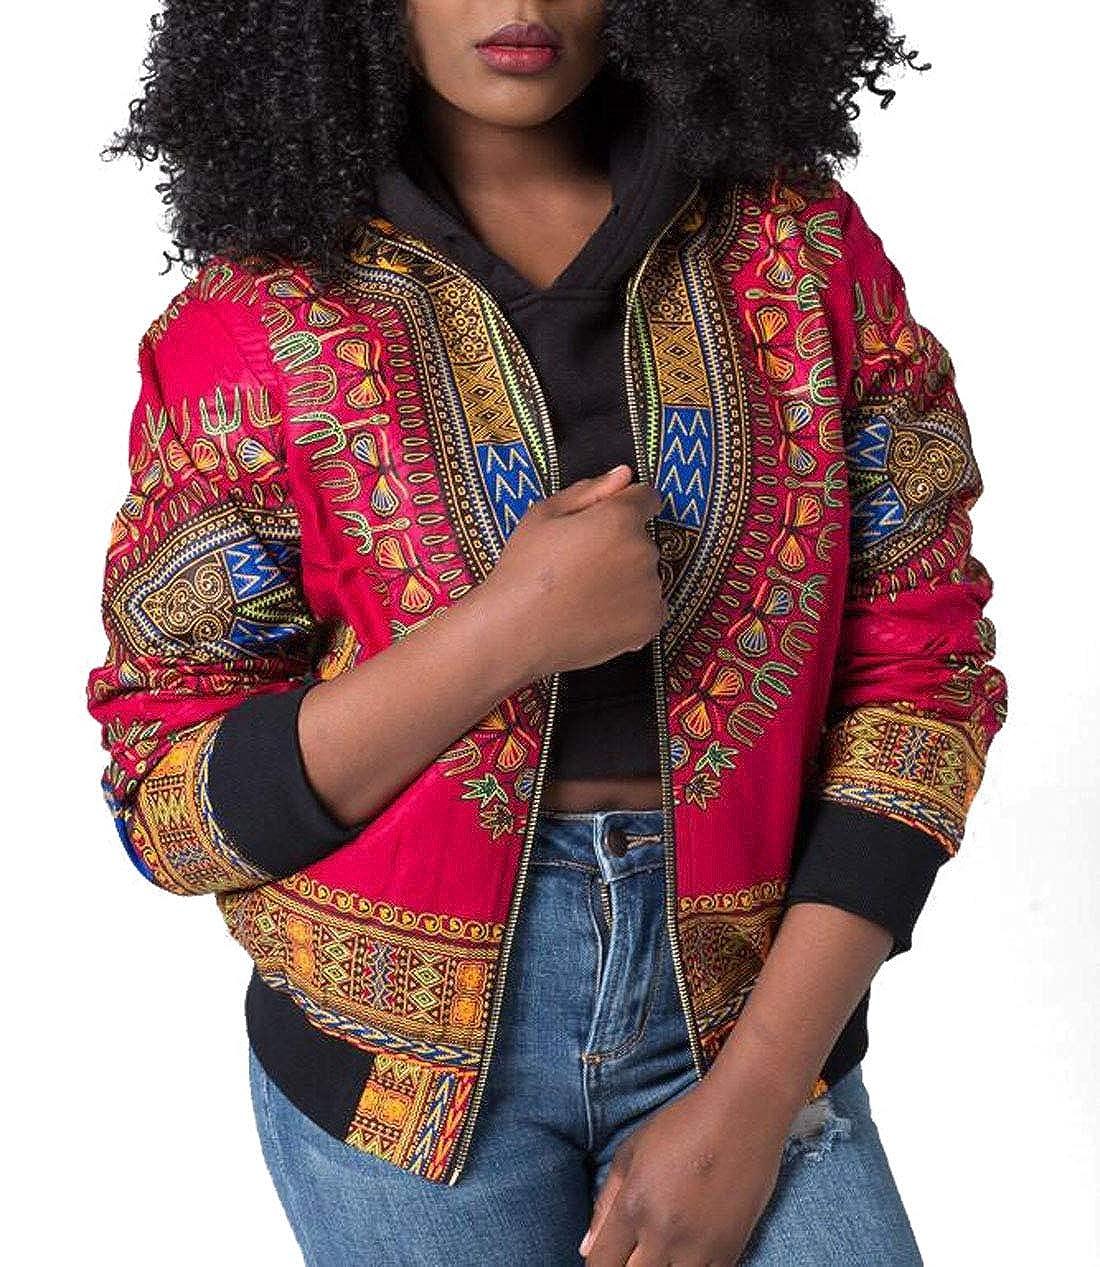 JackenLOVE Primavera e Autunno Donna Bomber Giacche Vintage Africano Stampa Jacket Cime Outerwear Moda Manica Lunga Cappotti Tops Coat Giacca con Zip